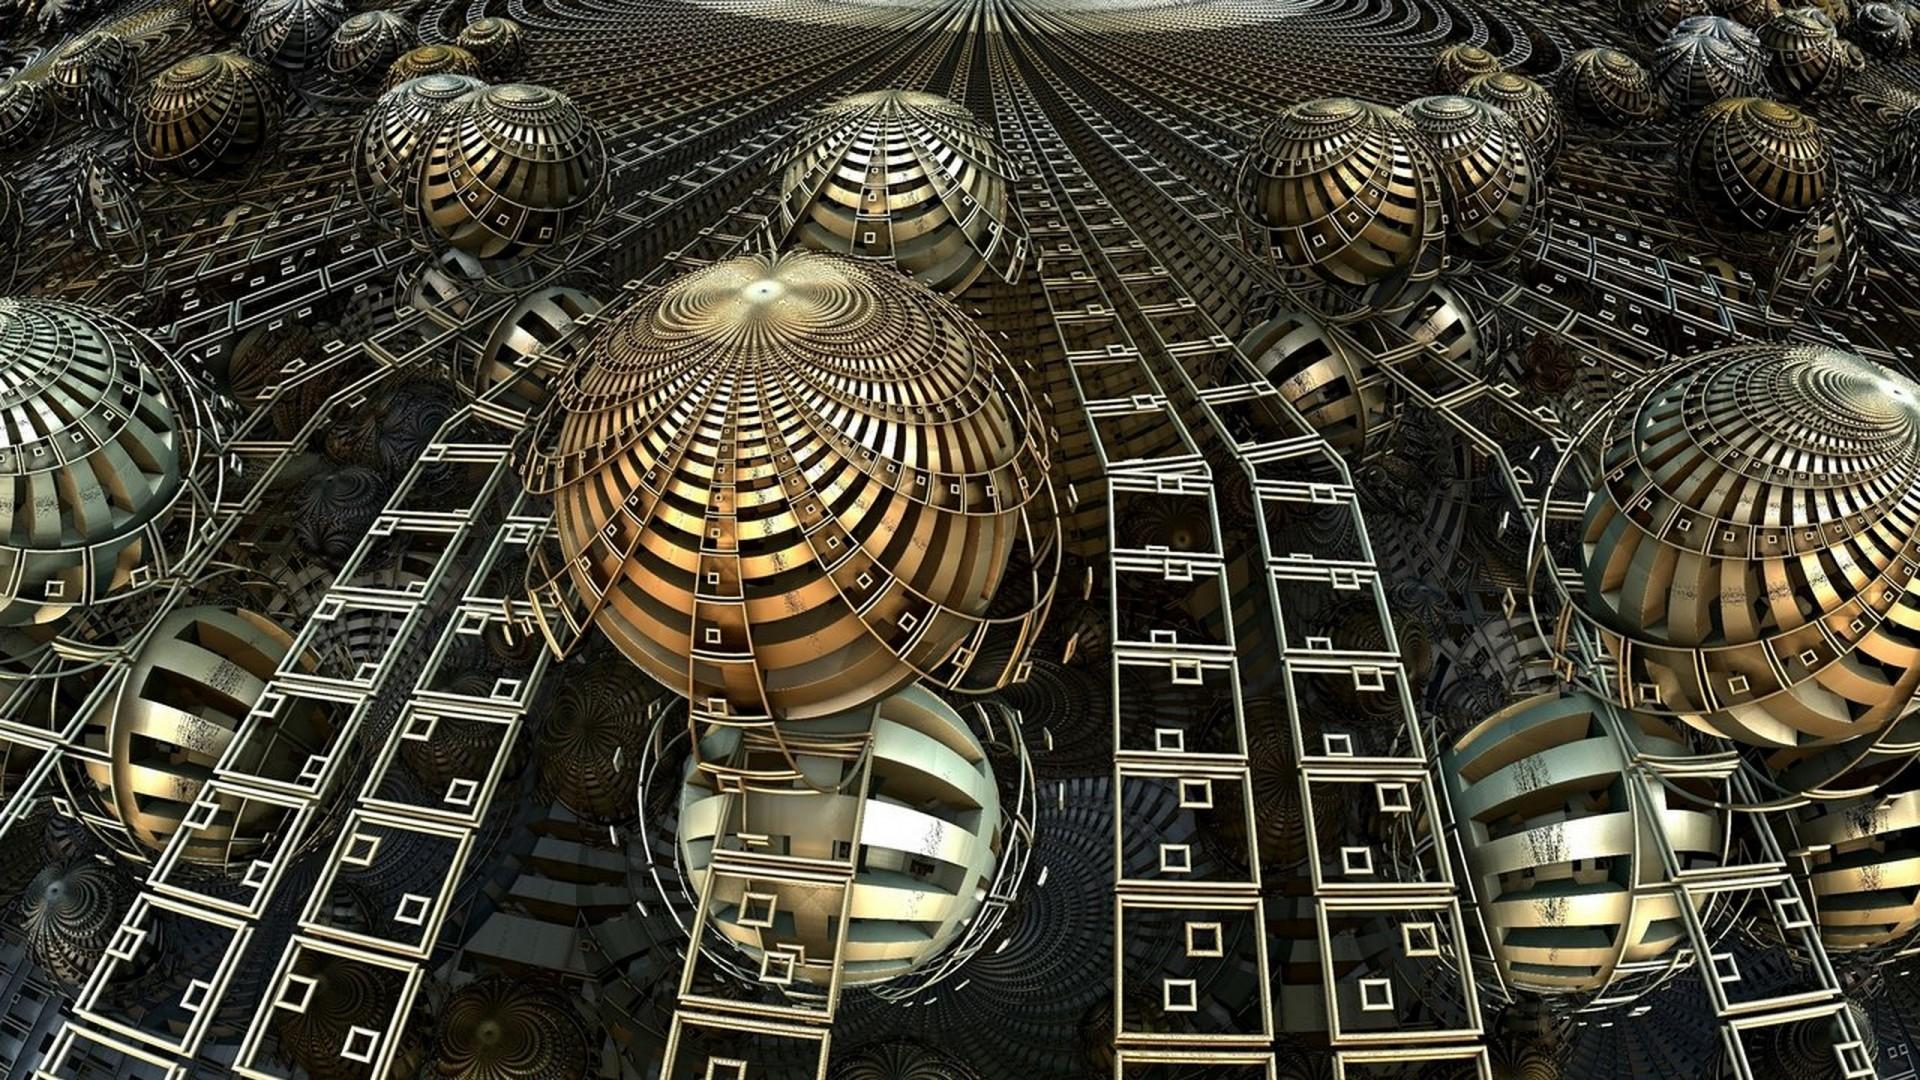 Download Wallpaper balls, lines, fractal, illusion Full HD 1080p  HD Background